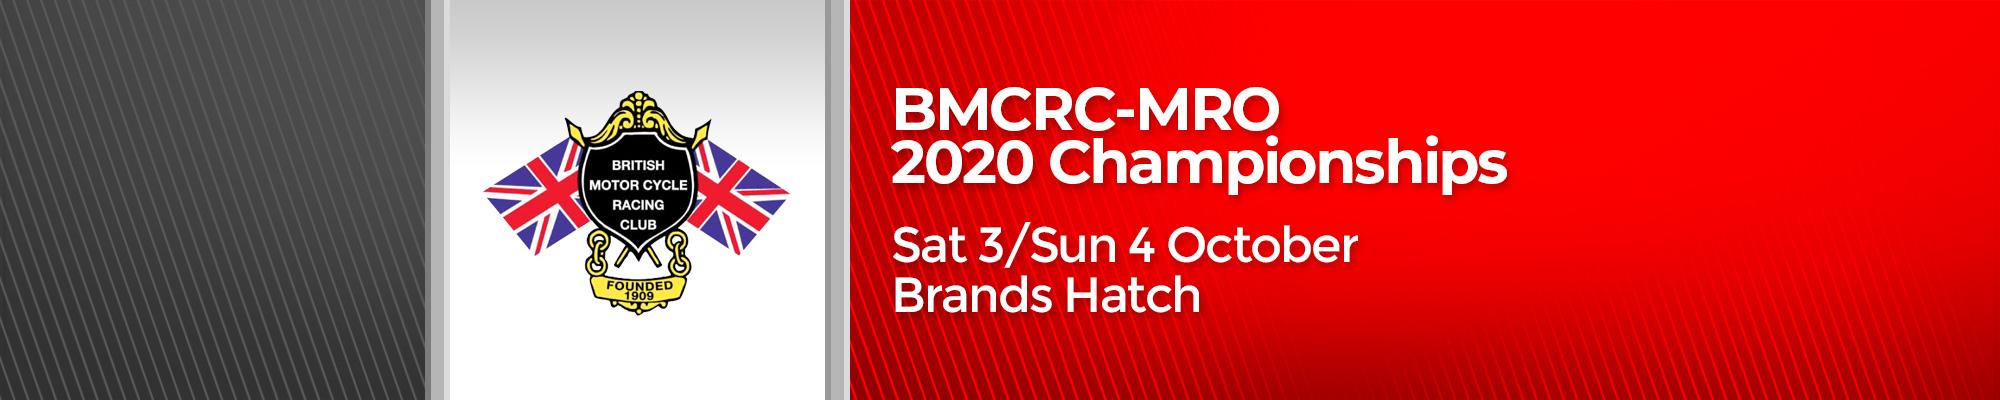 BMCRC-MRO 2020 Championships